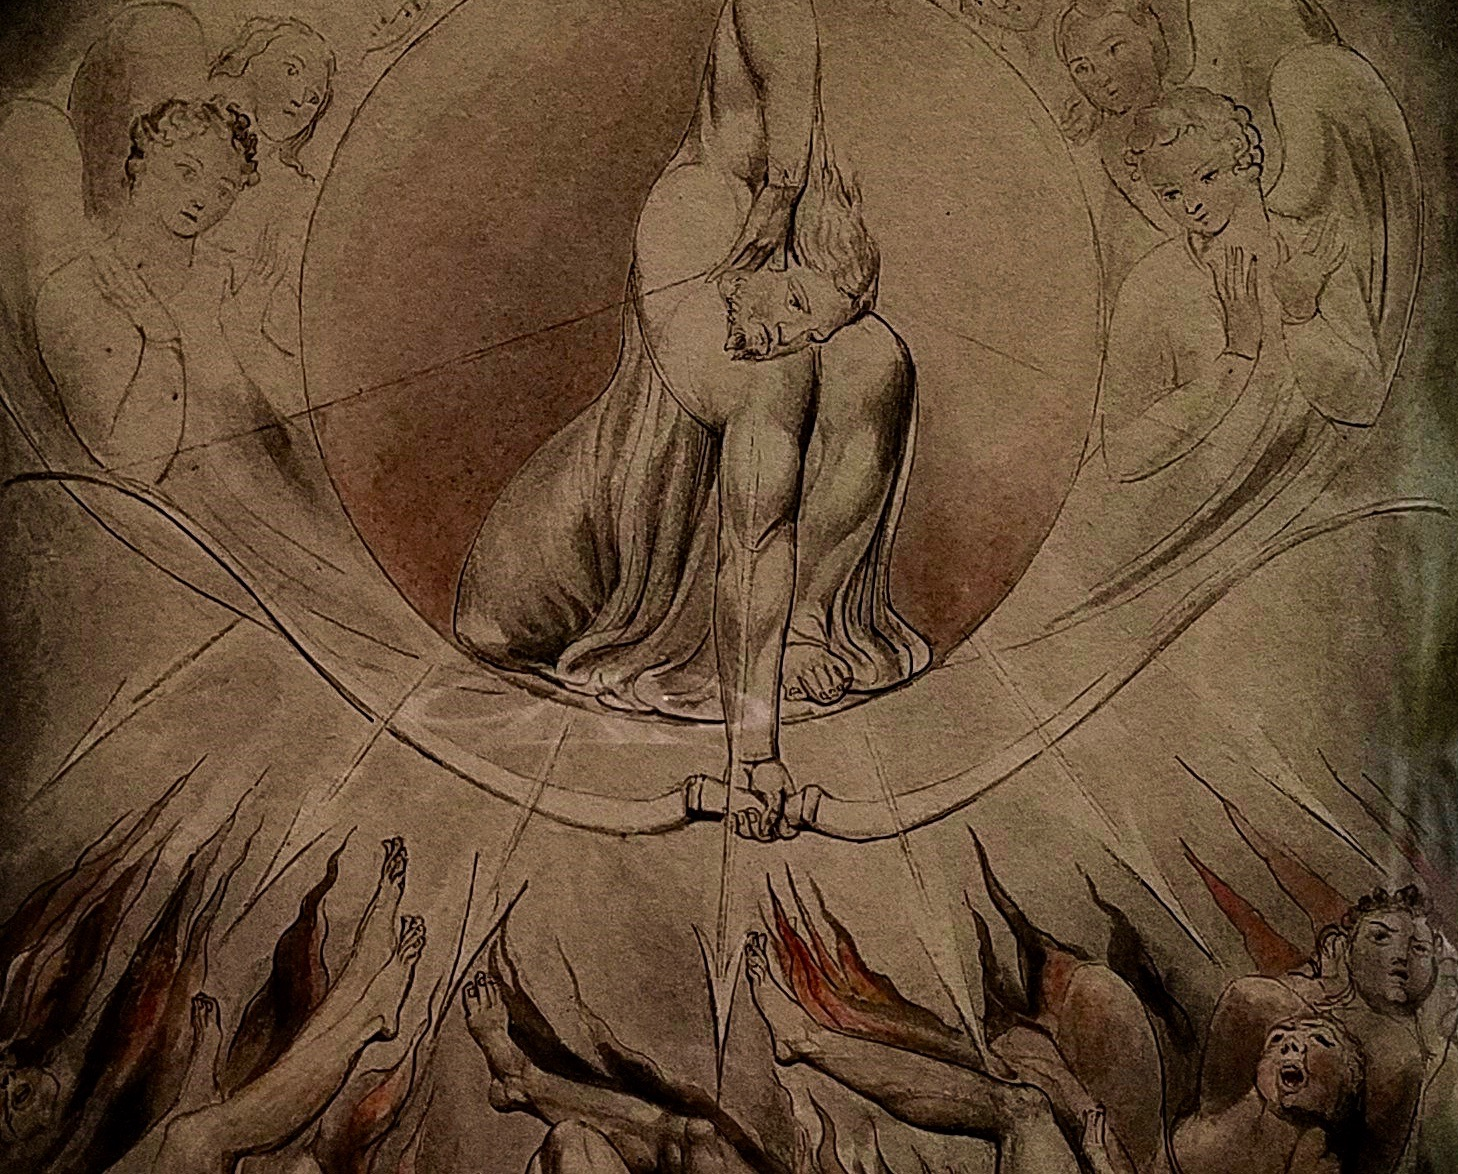 Esoteric Apollo: The Unmentionable, Untarnished Apollo & The Demon